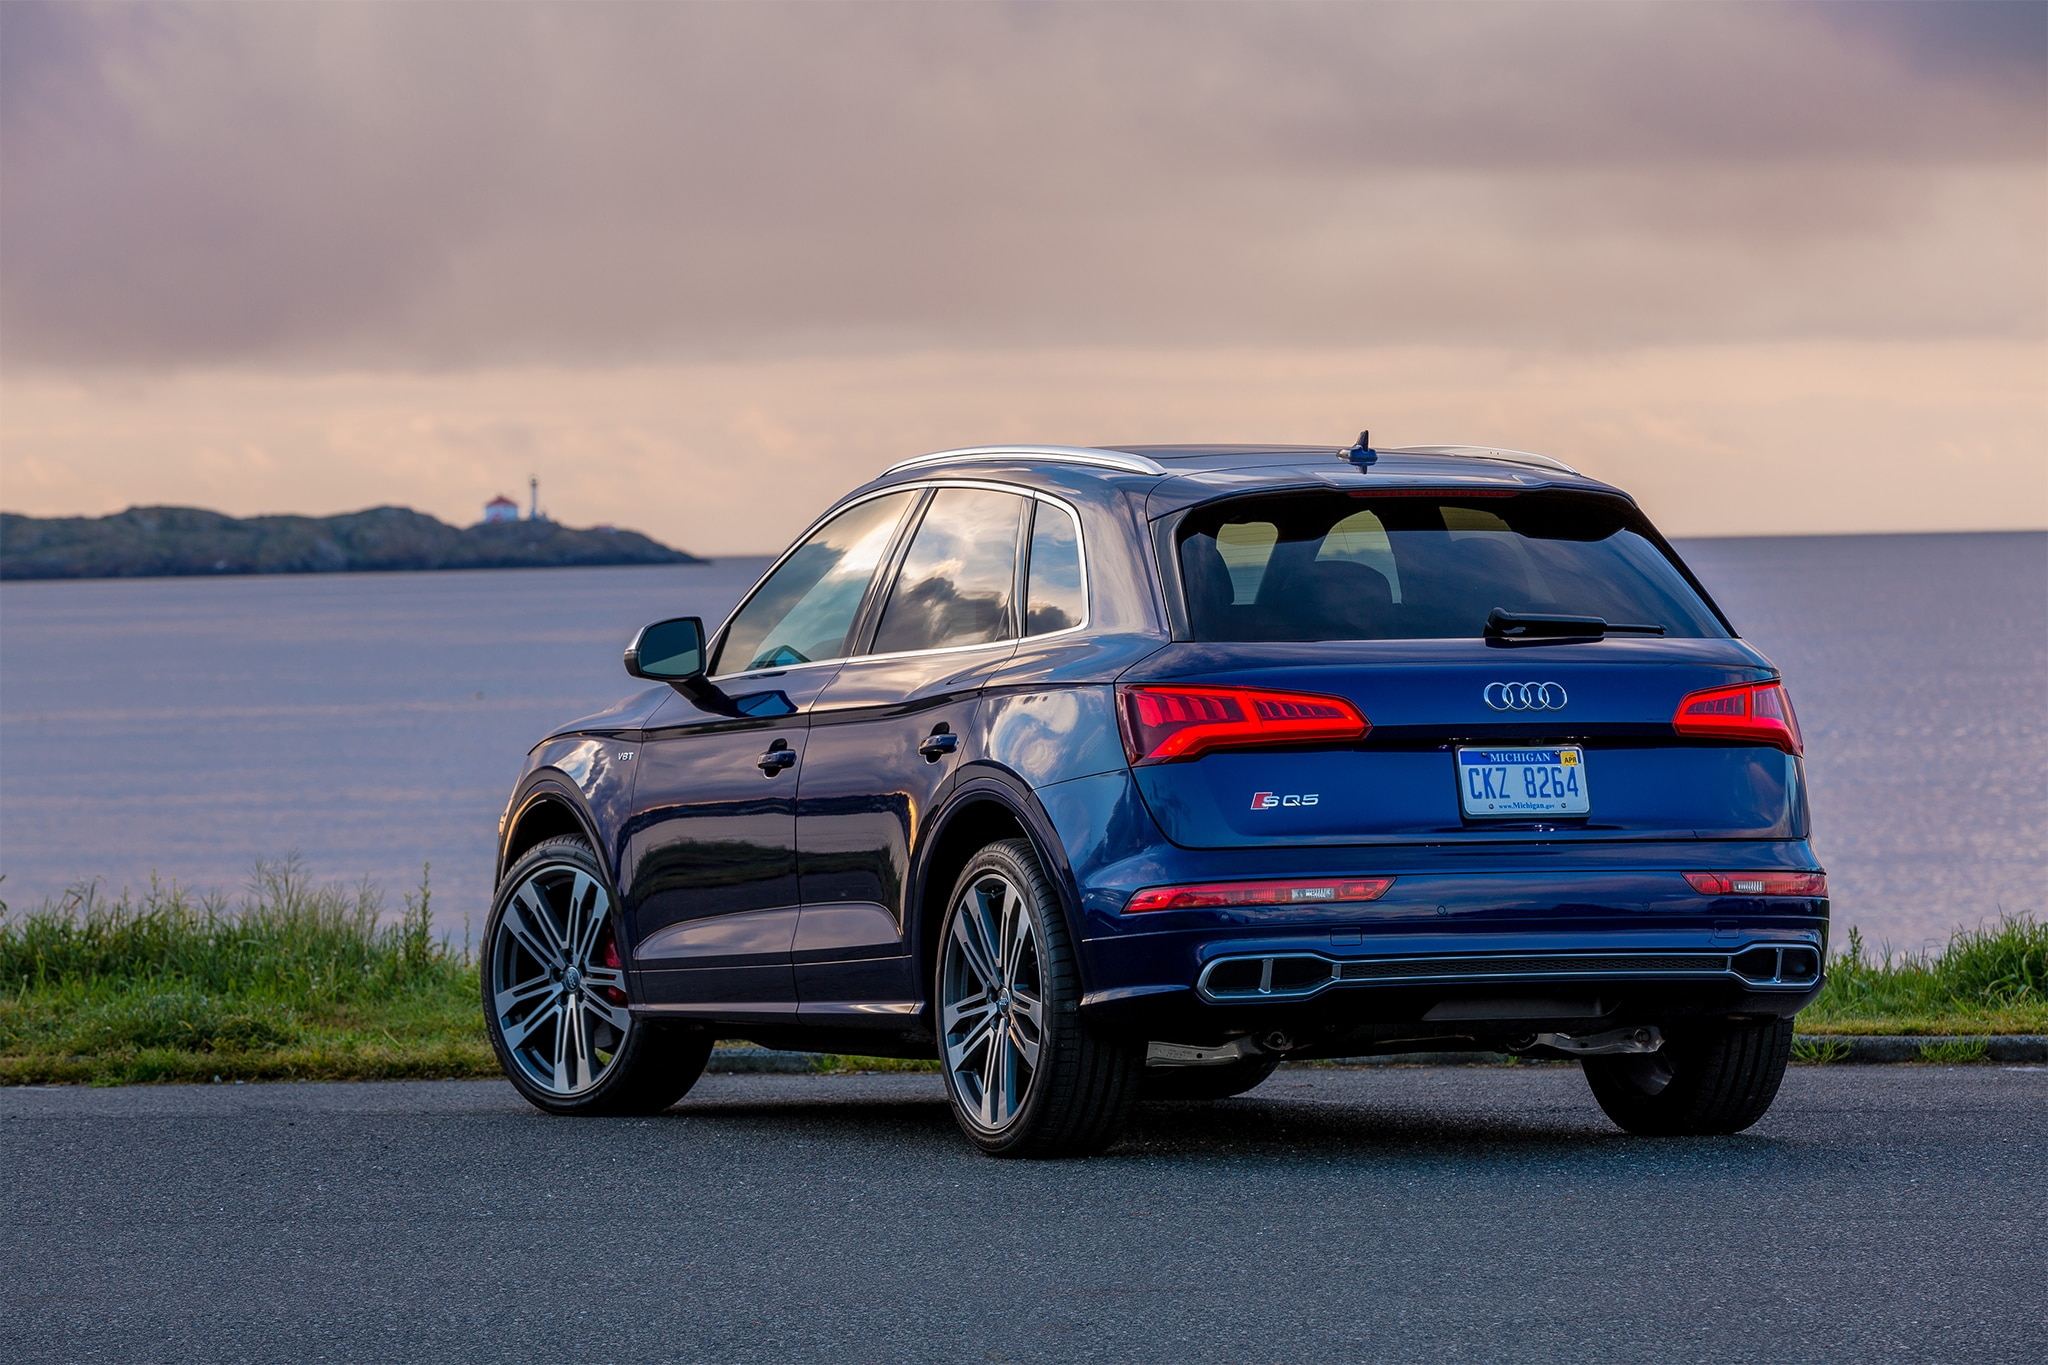 8 Passenger Suv >> 2018 Audi SQ5 First Drive Review | Automobile Magazine